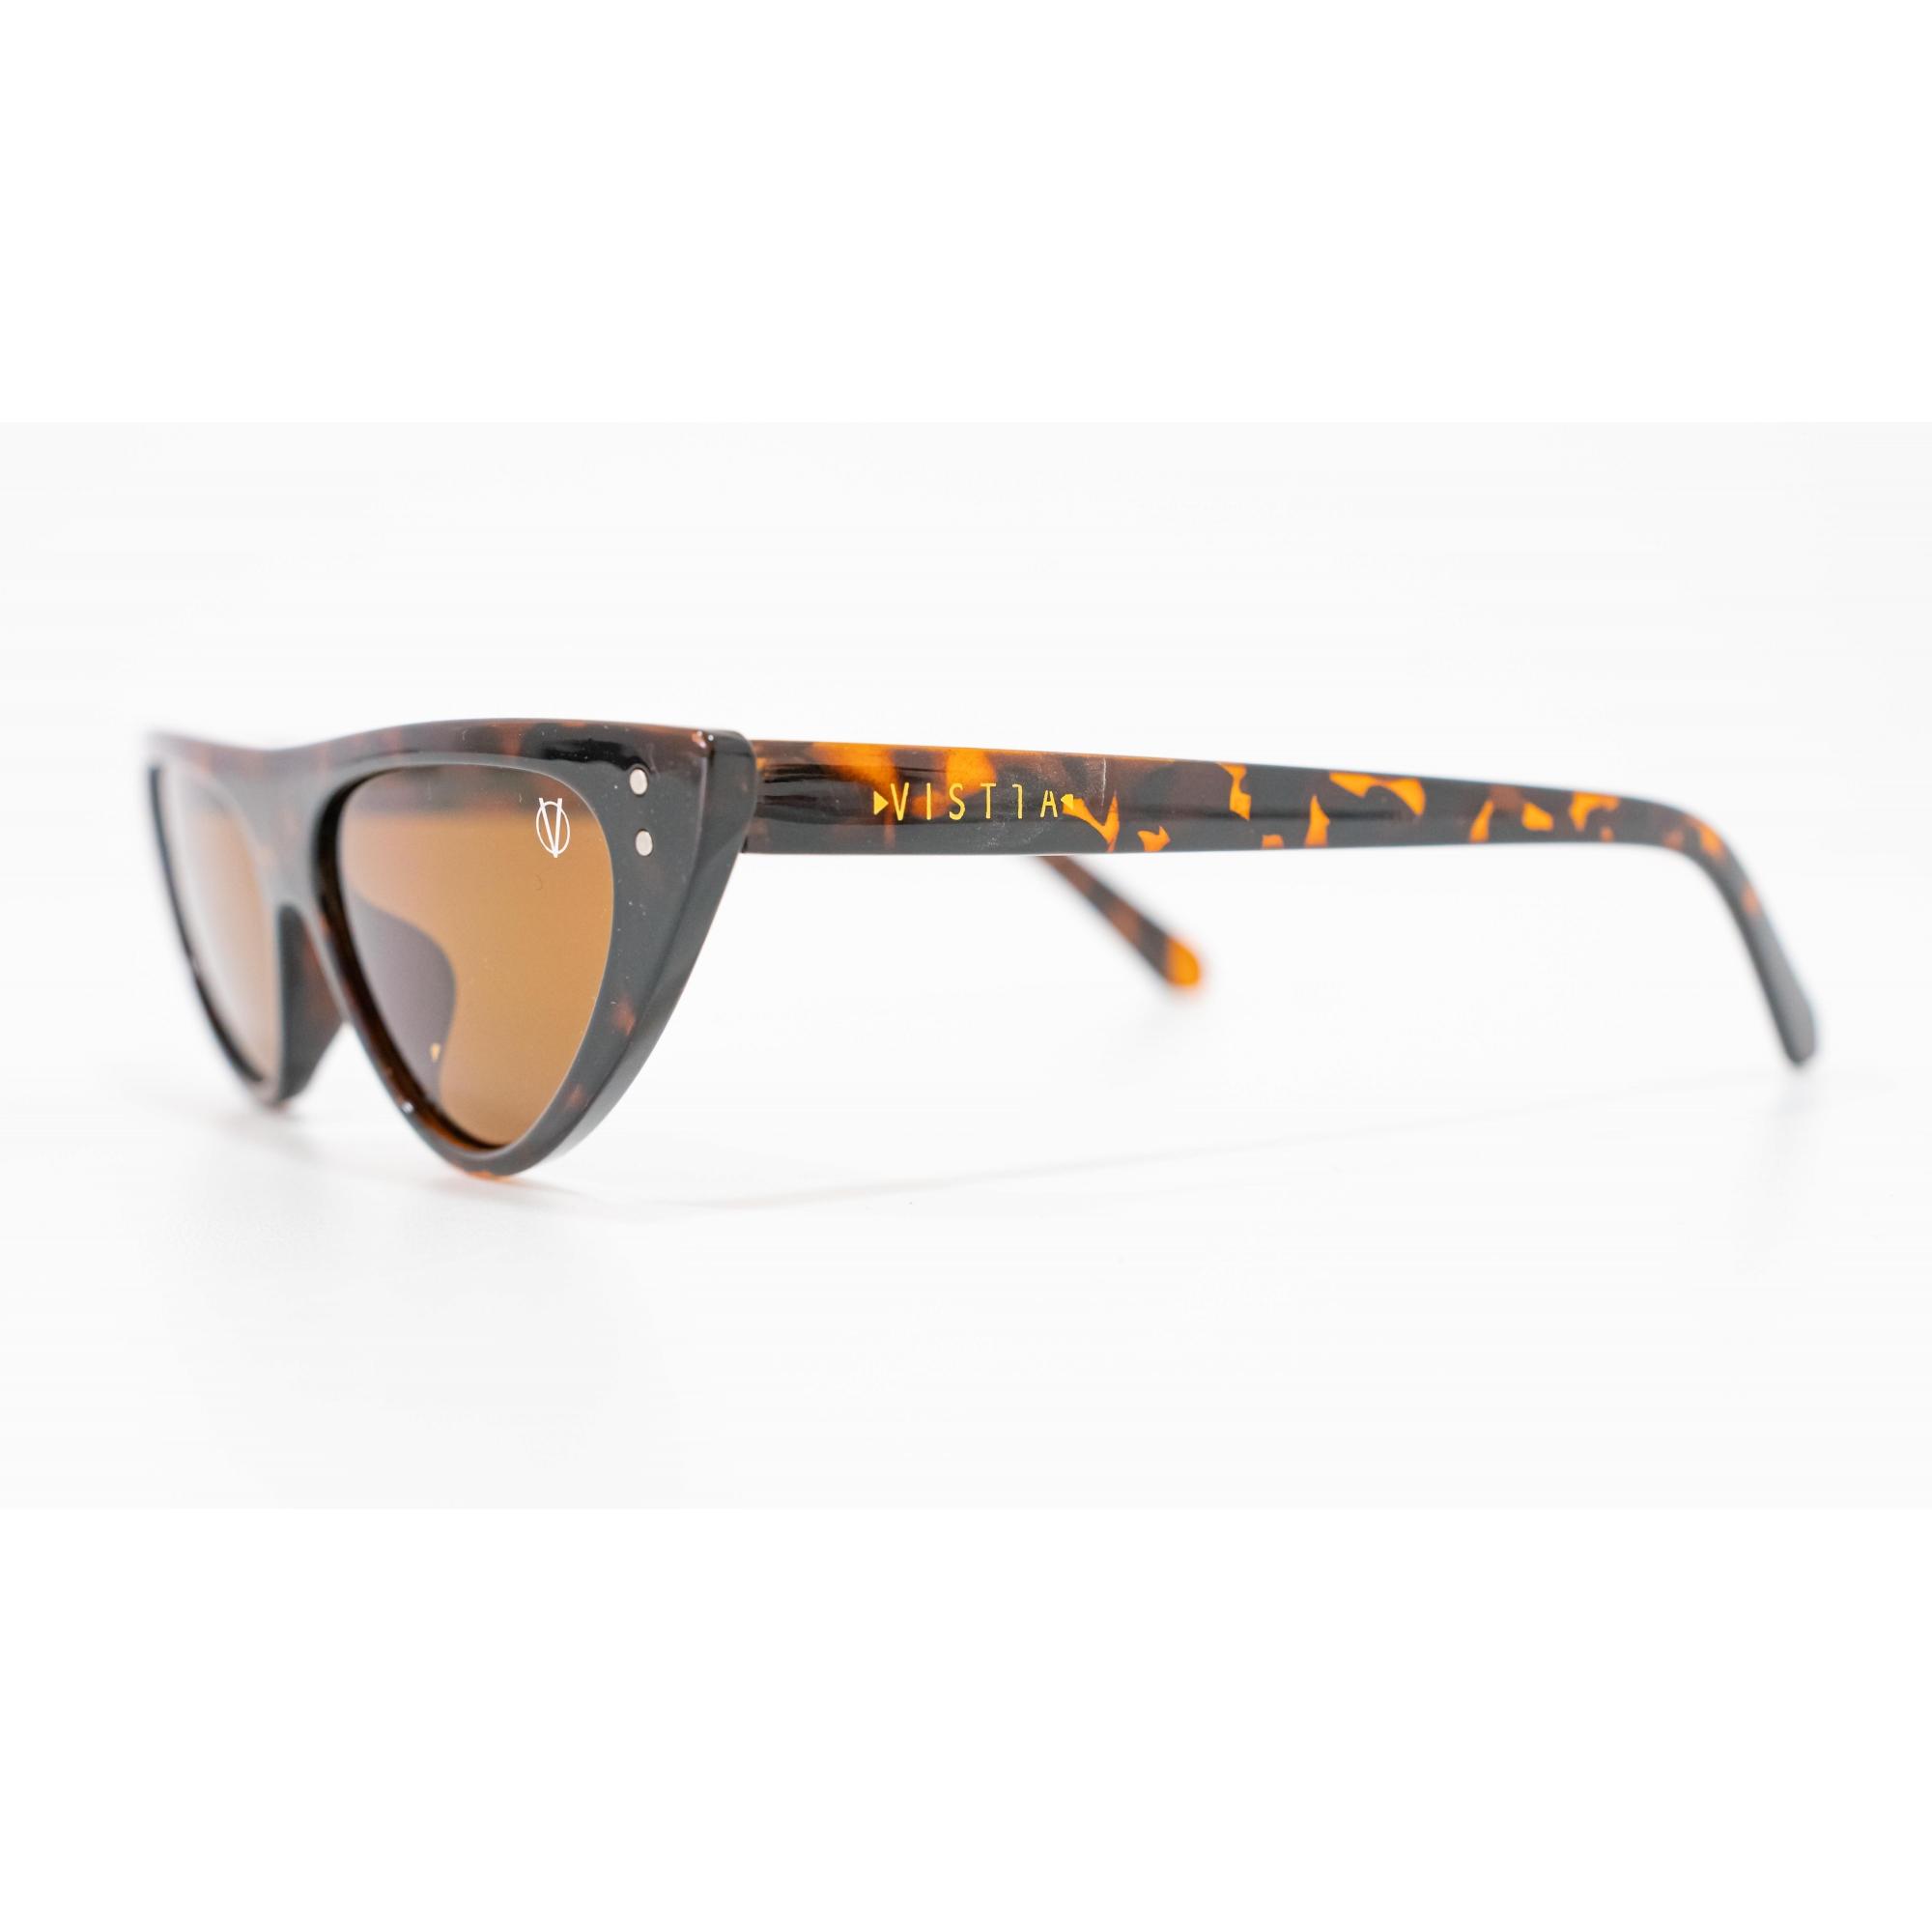 Óculos Vistta Aping Cat Eye RF1039 C3 53 Tartaruga